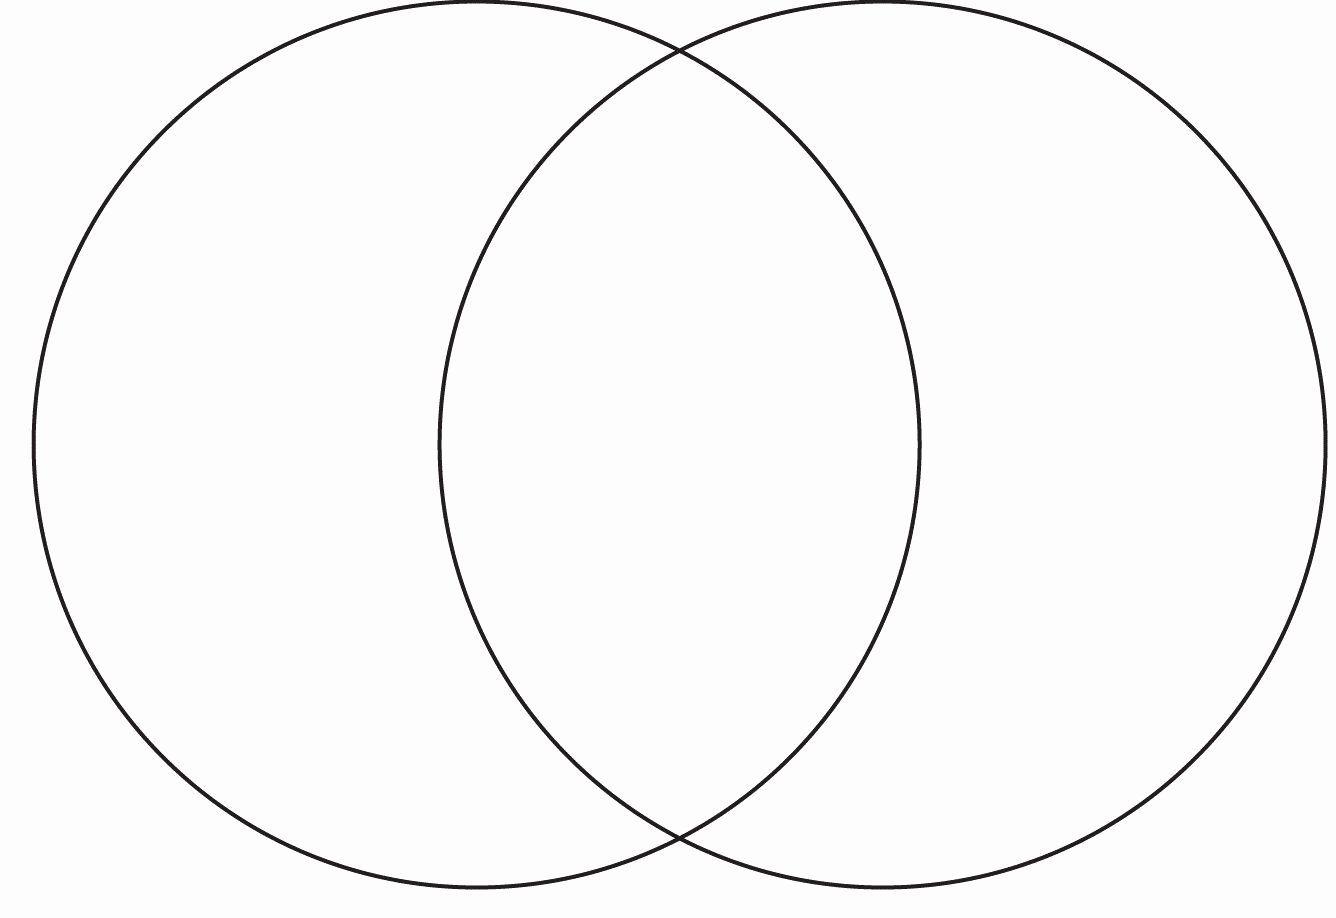 Venn Diagram Template Doc Elegant Printable Page Size Venn